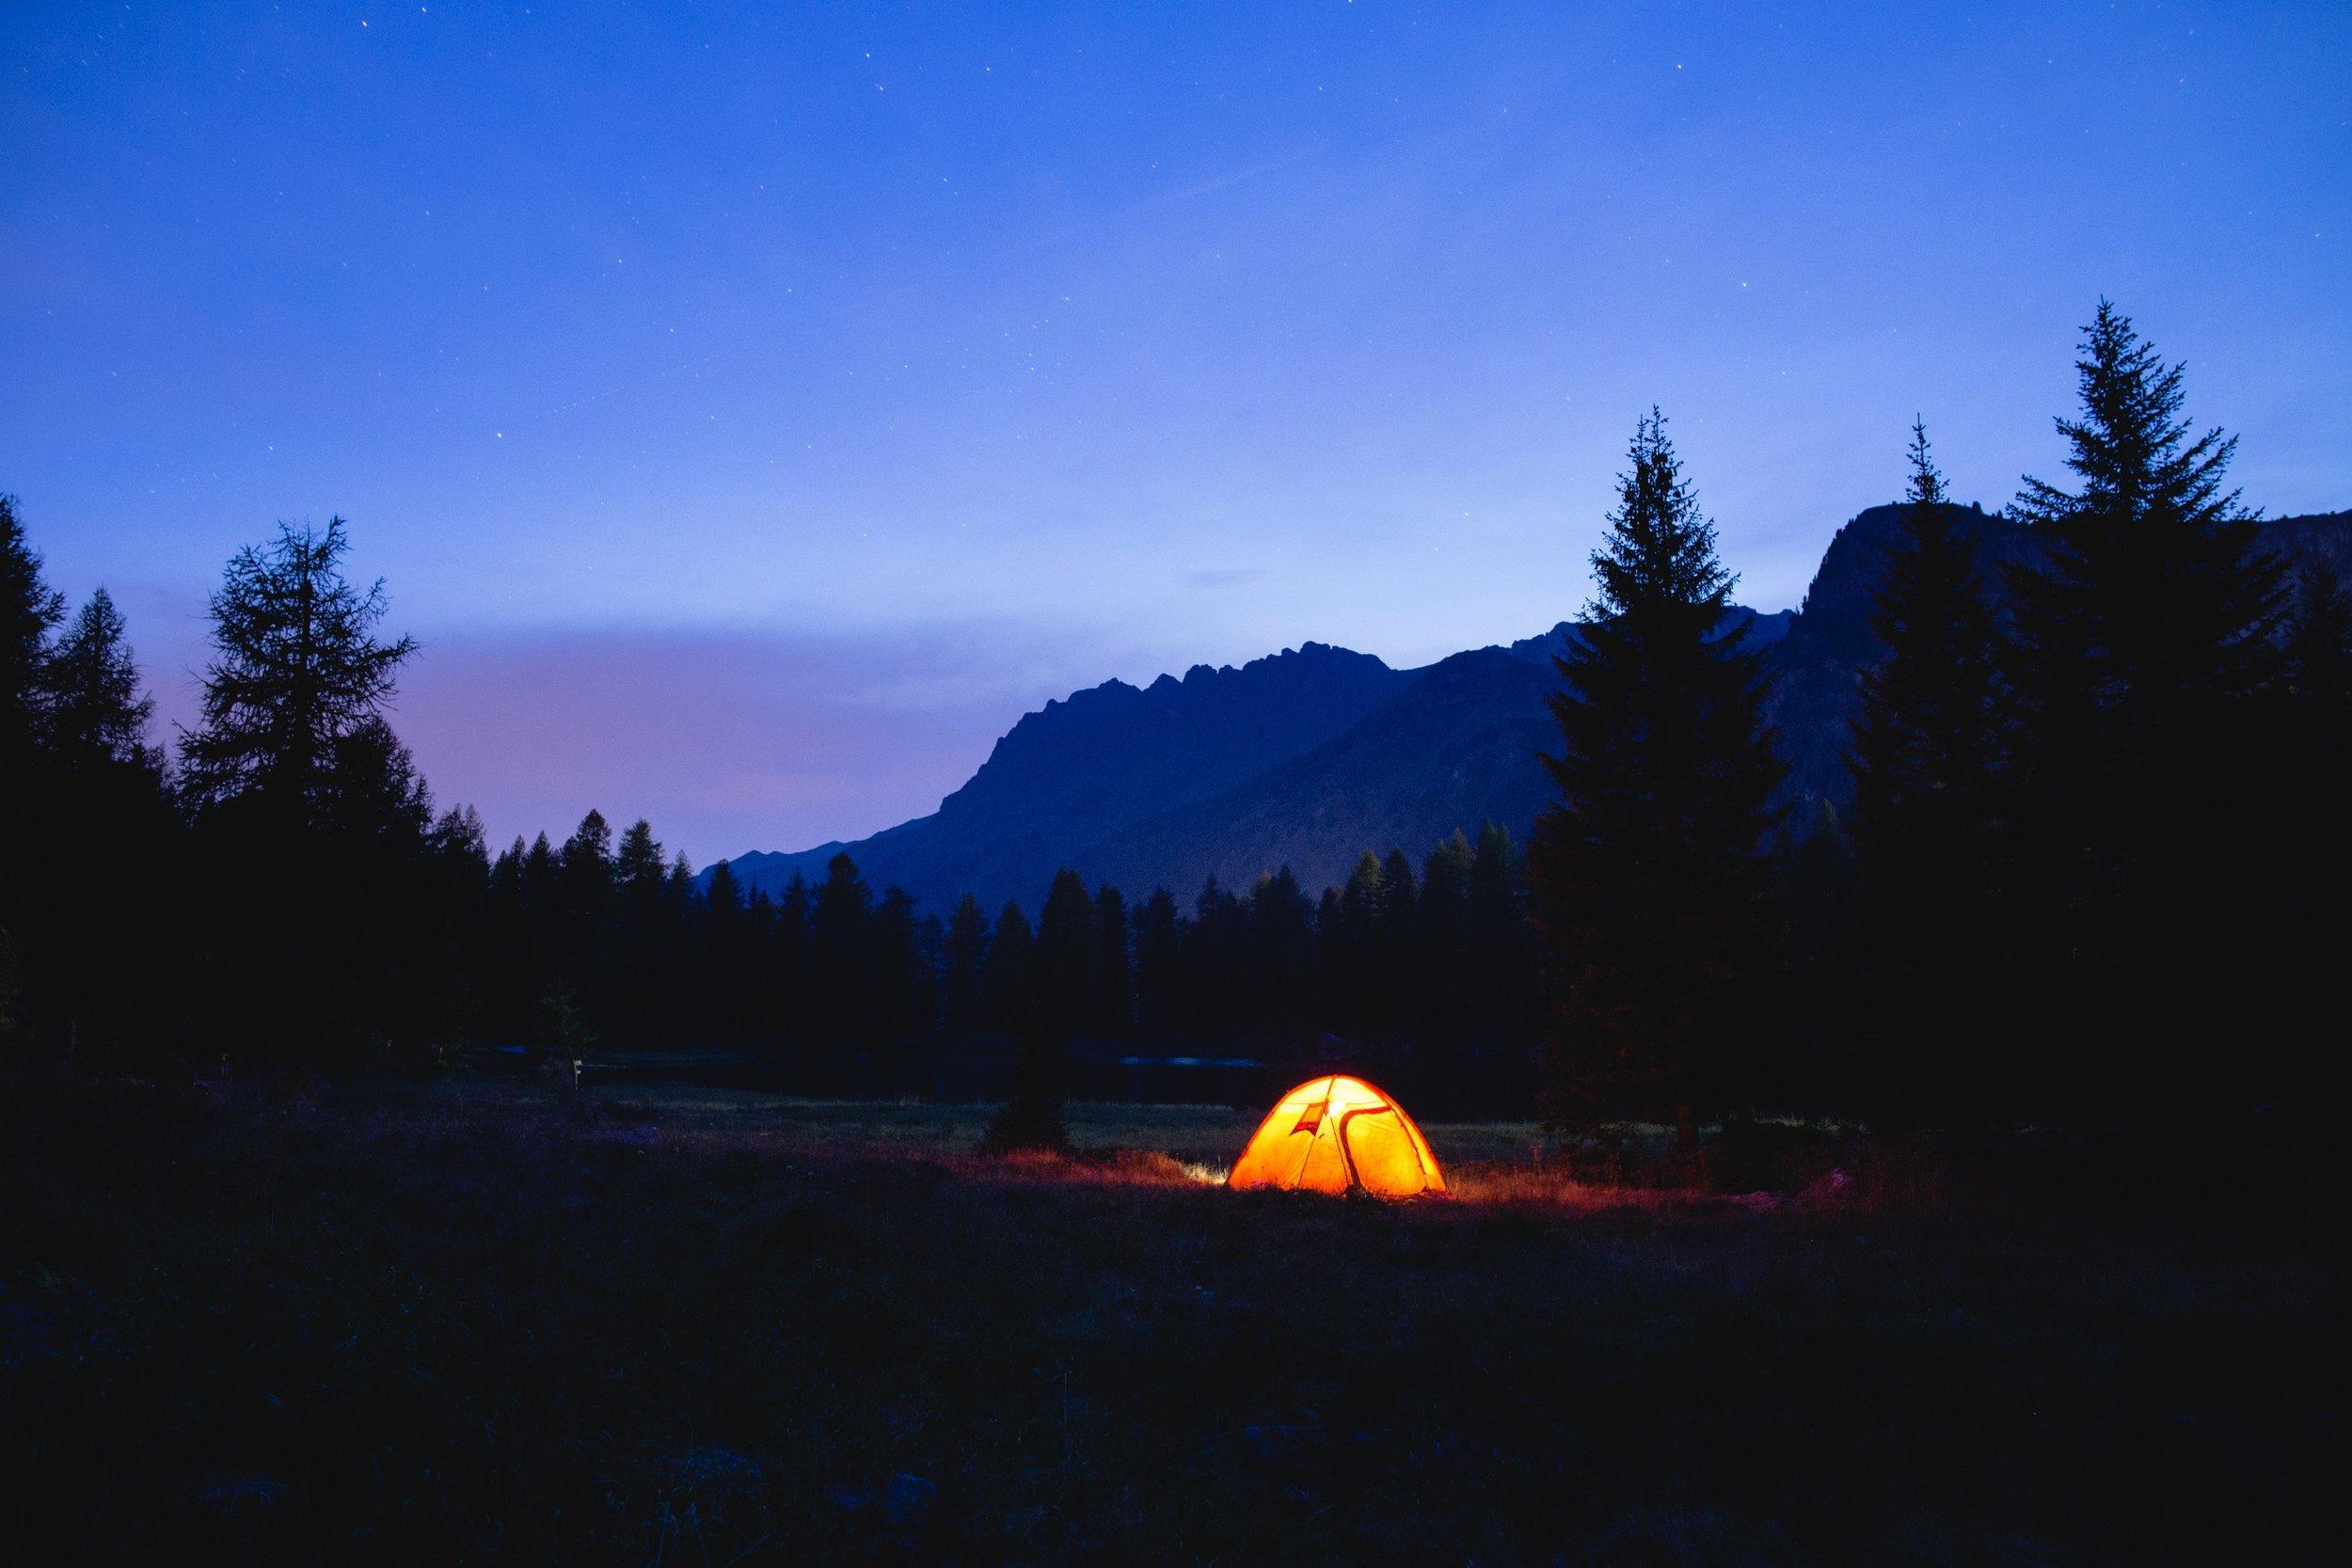 An illuminated tent under a darkening sky.